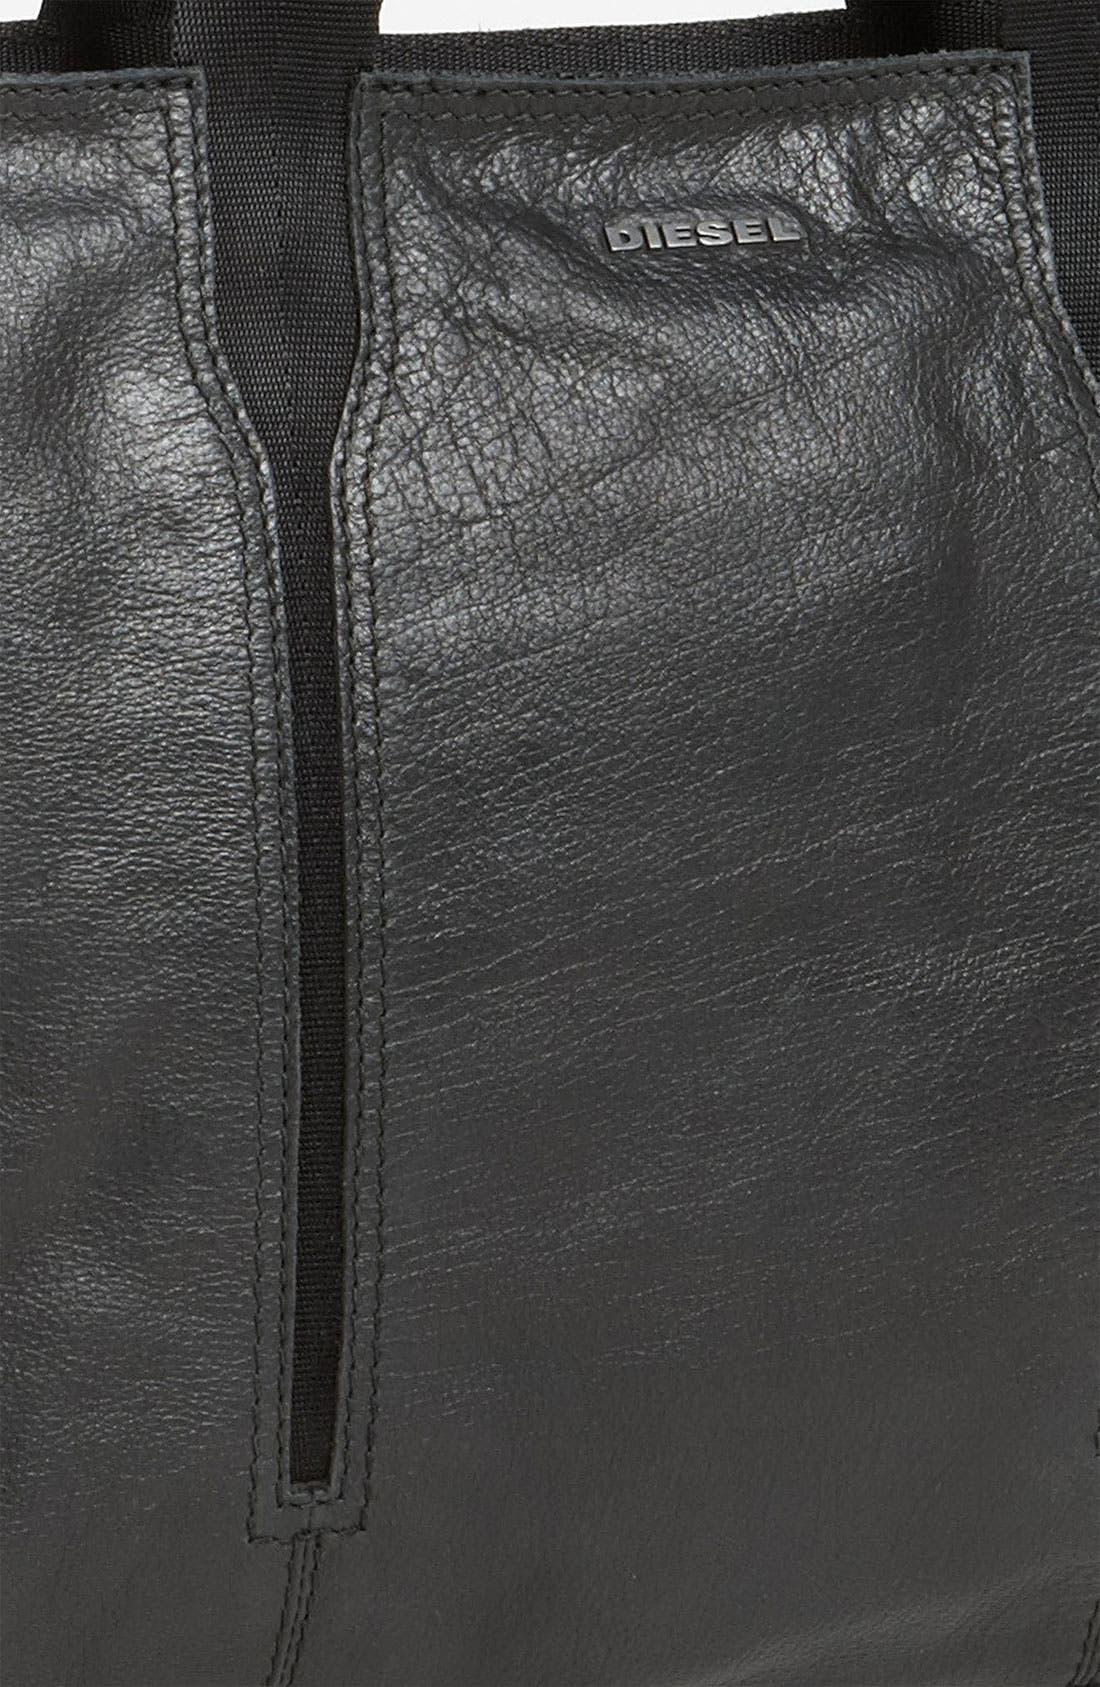 Alternate Image 5  - DIESEL® 'City Slicky' Tote Bag